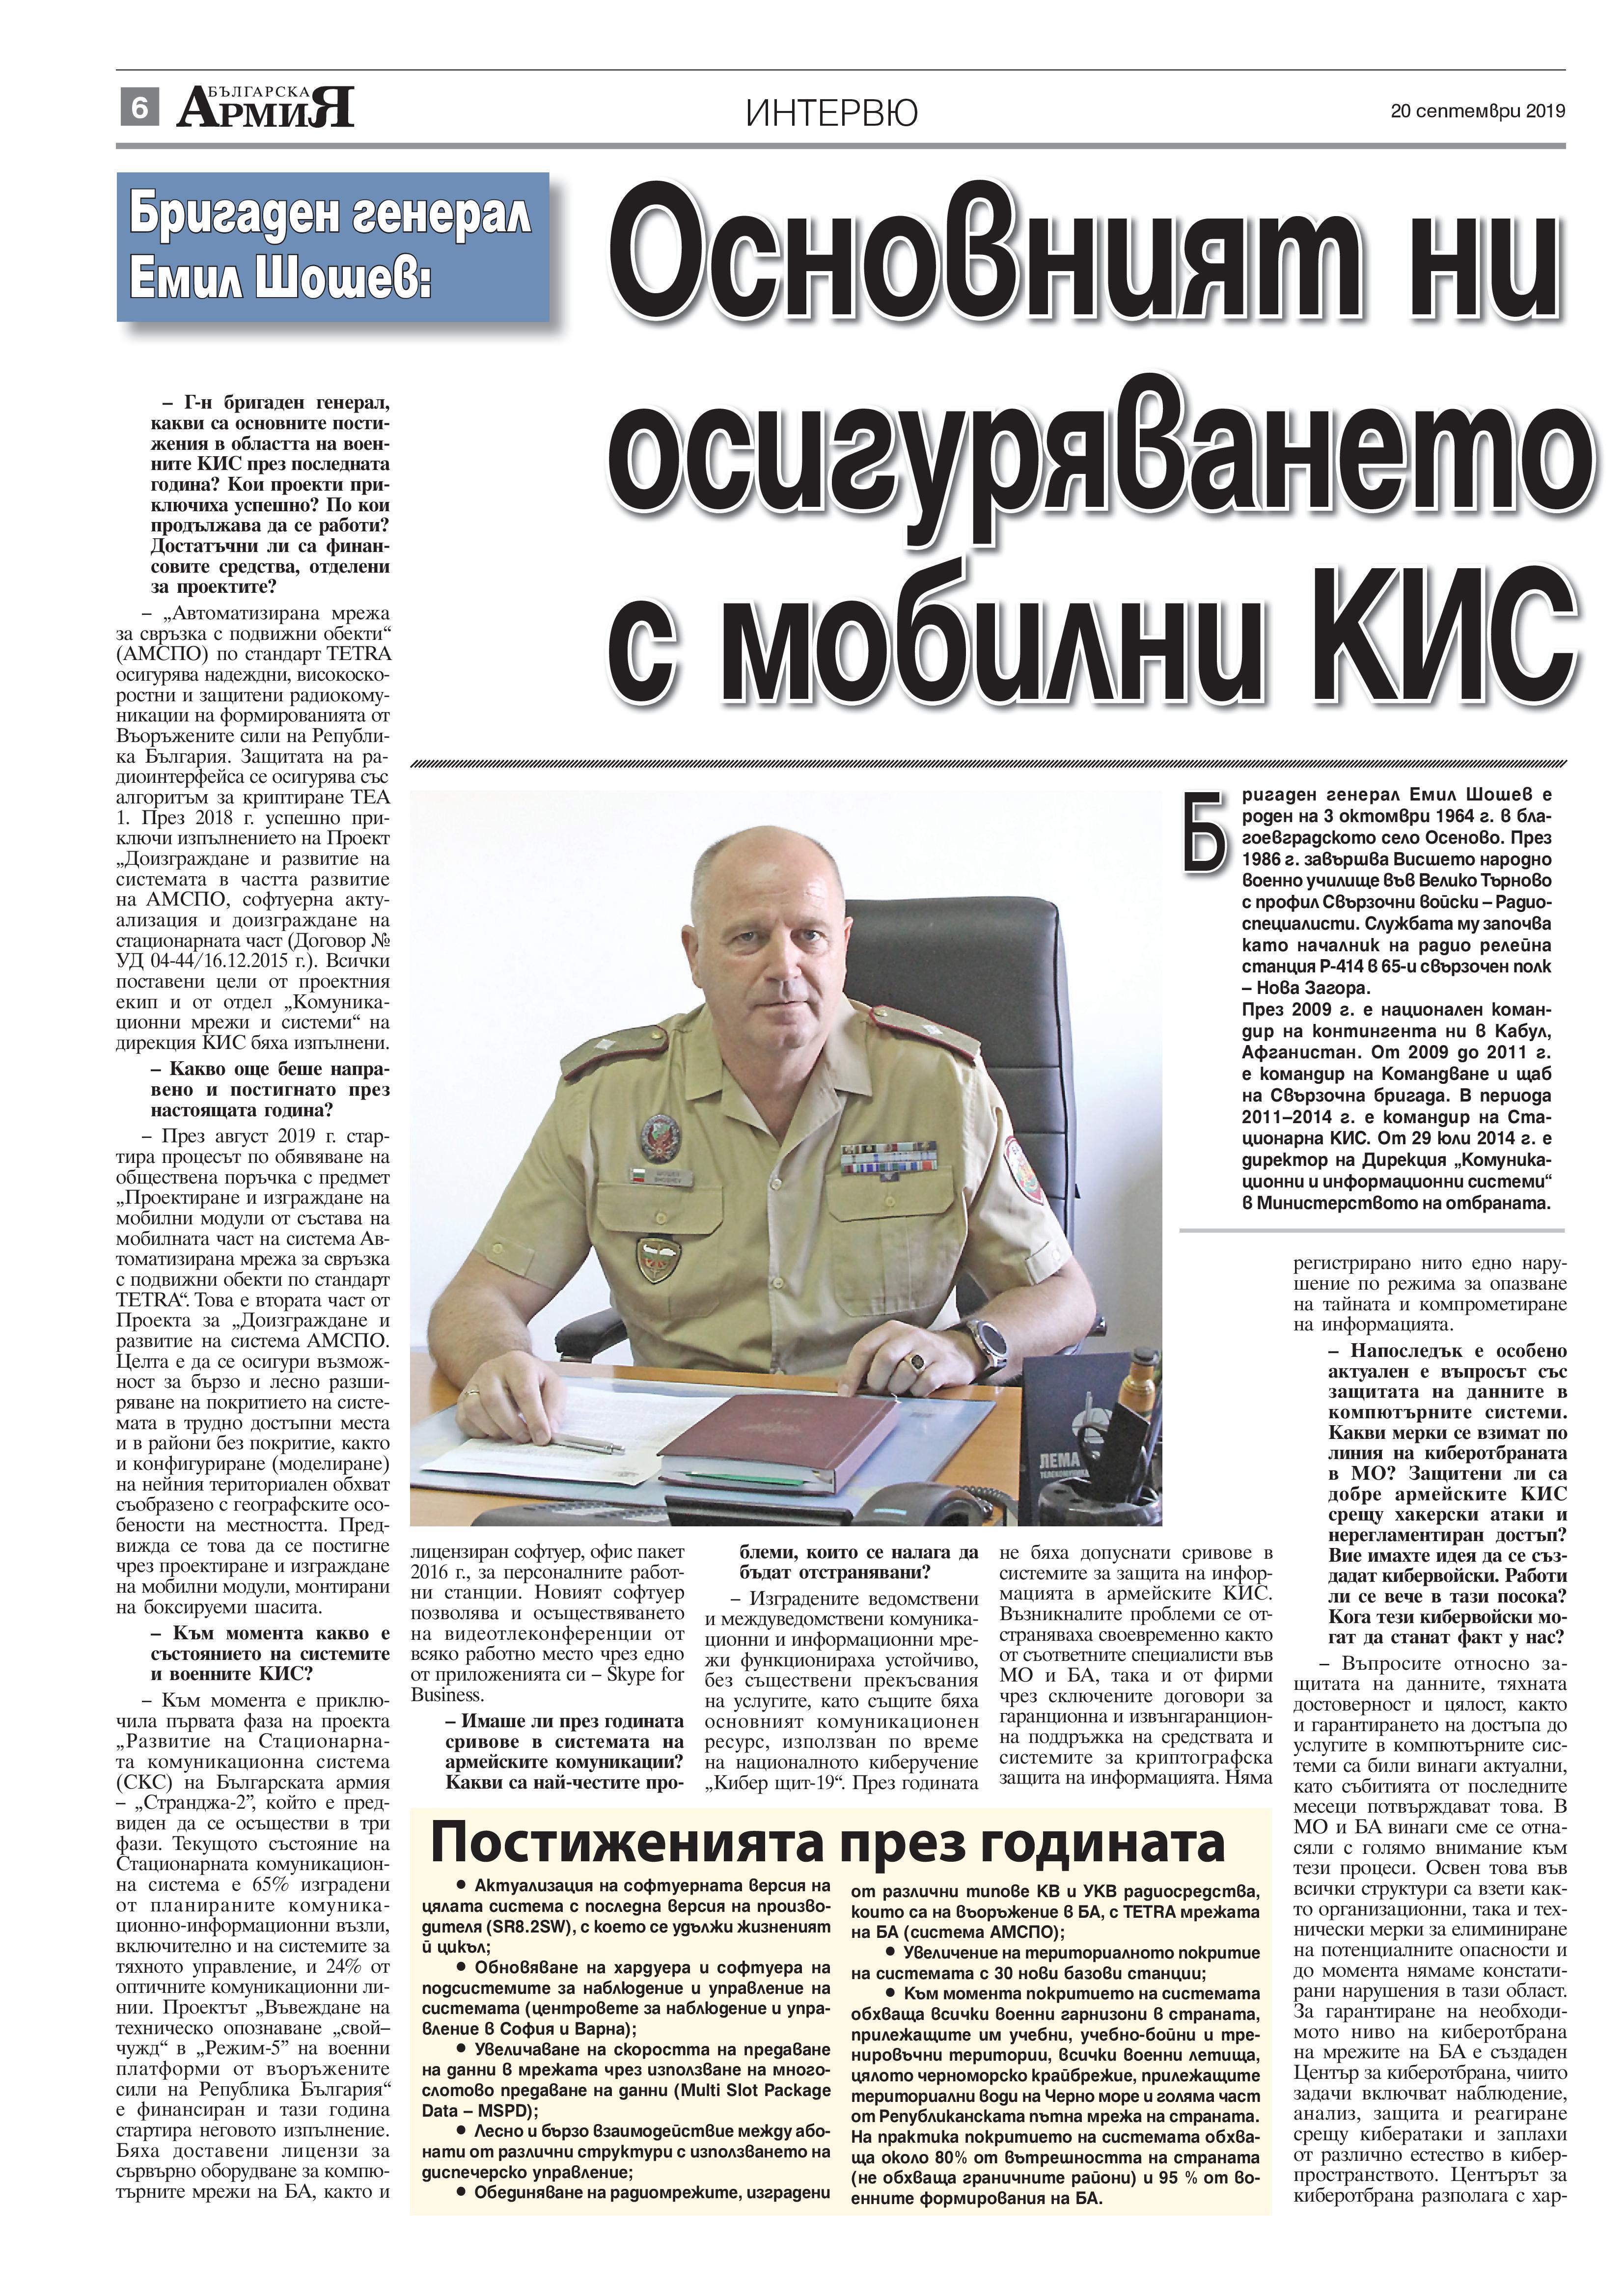 https://www.armymedia.bg/wp-content/uploads/2015/06/06-31.jpg